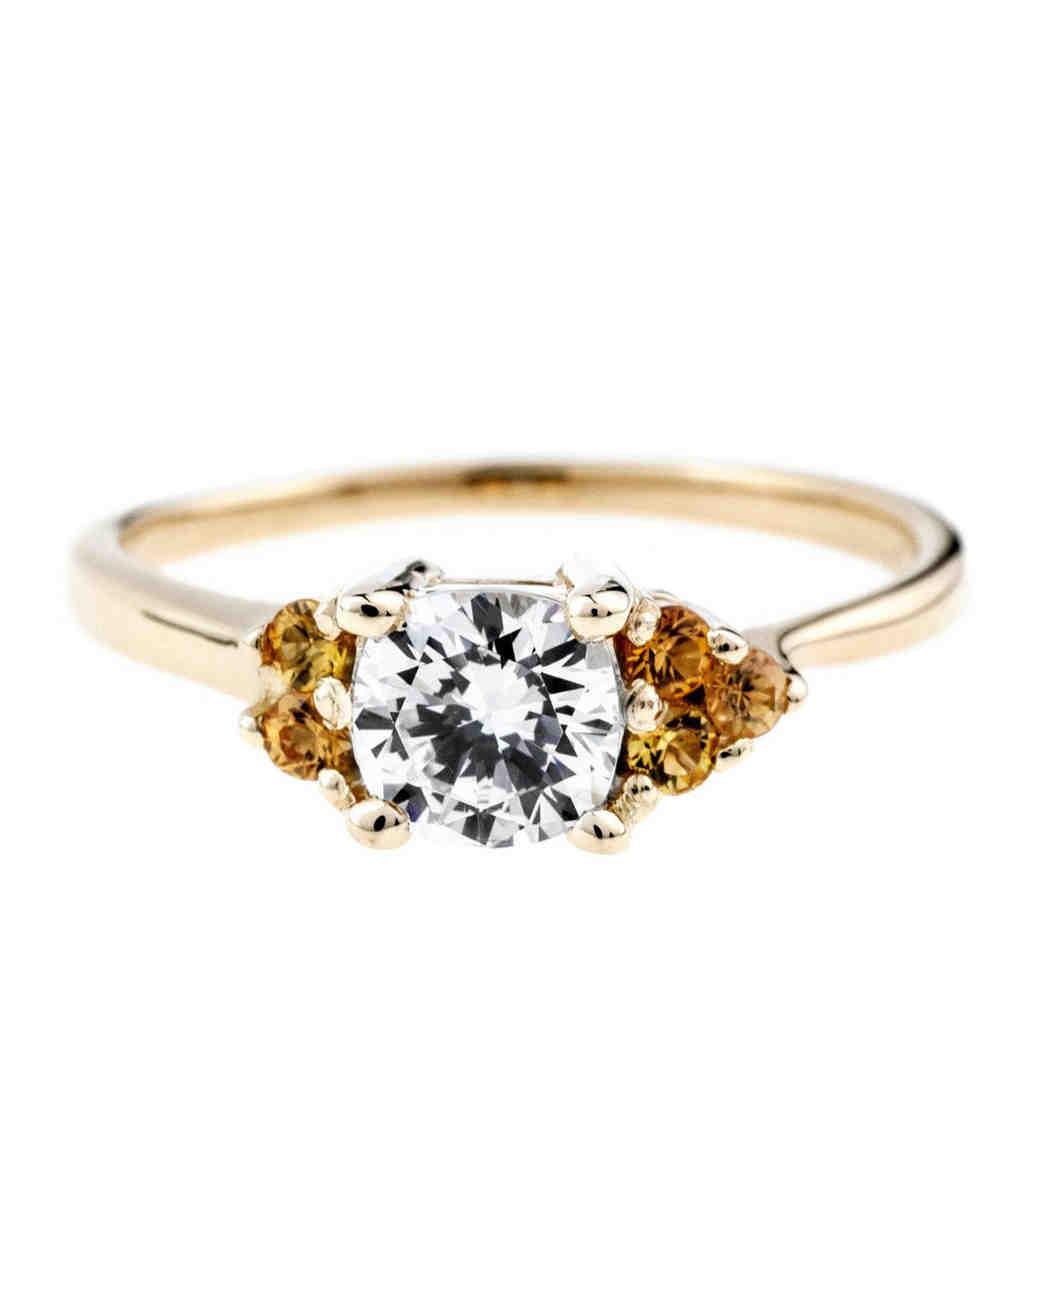 Bario Neal Asymmetrical Avens Ring with Cushion Cut Diamond